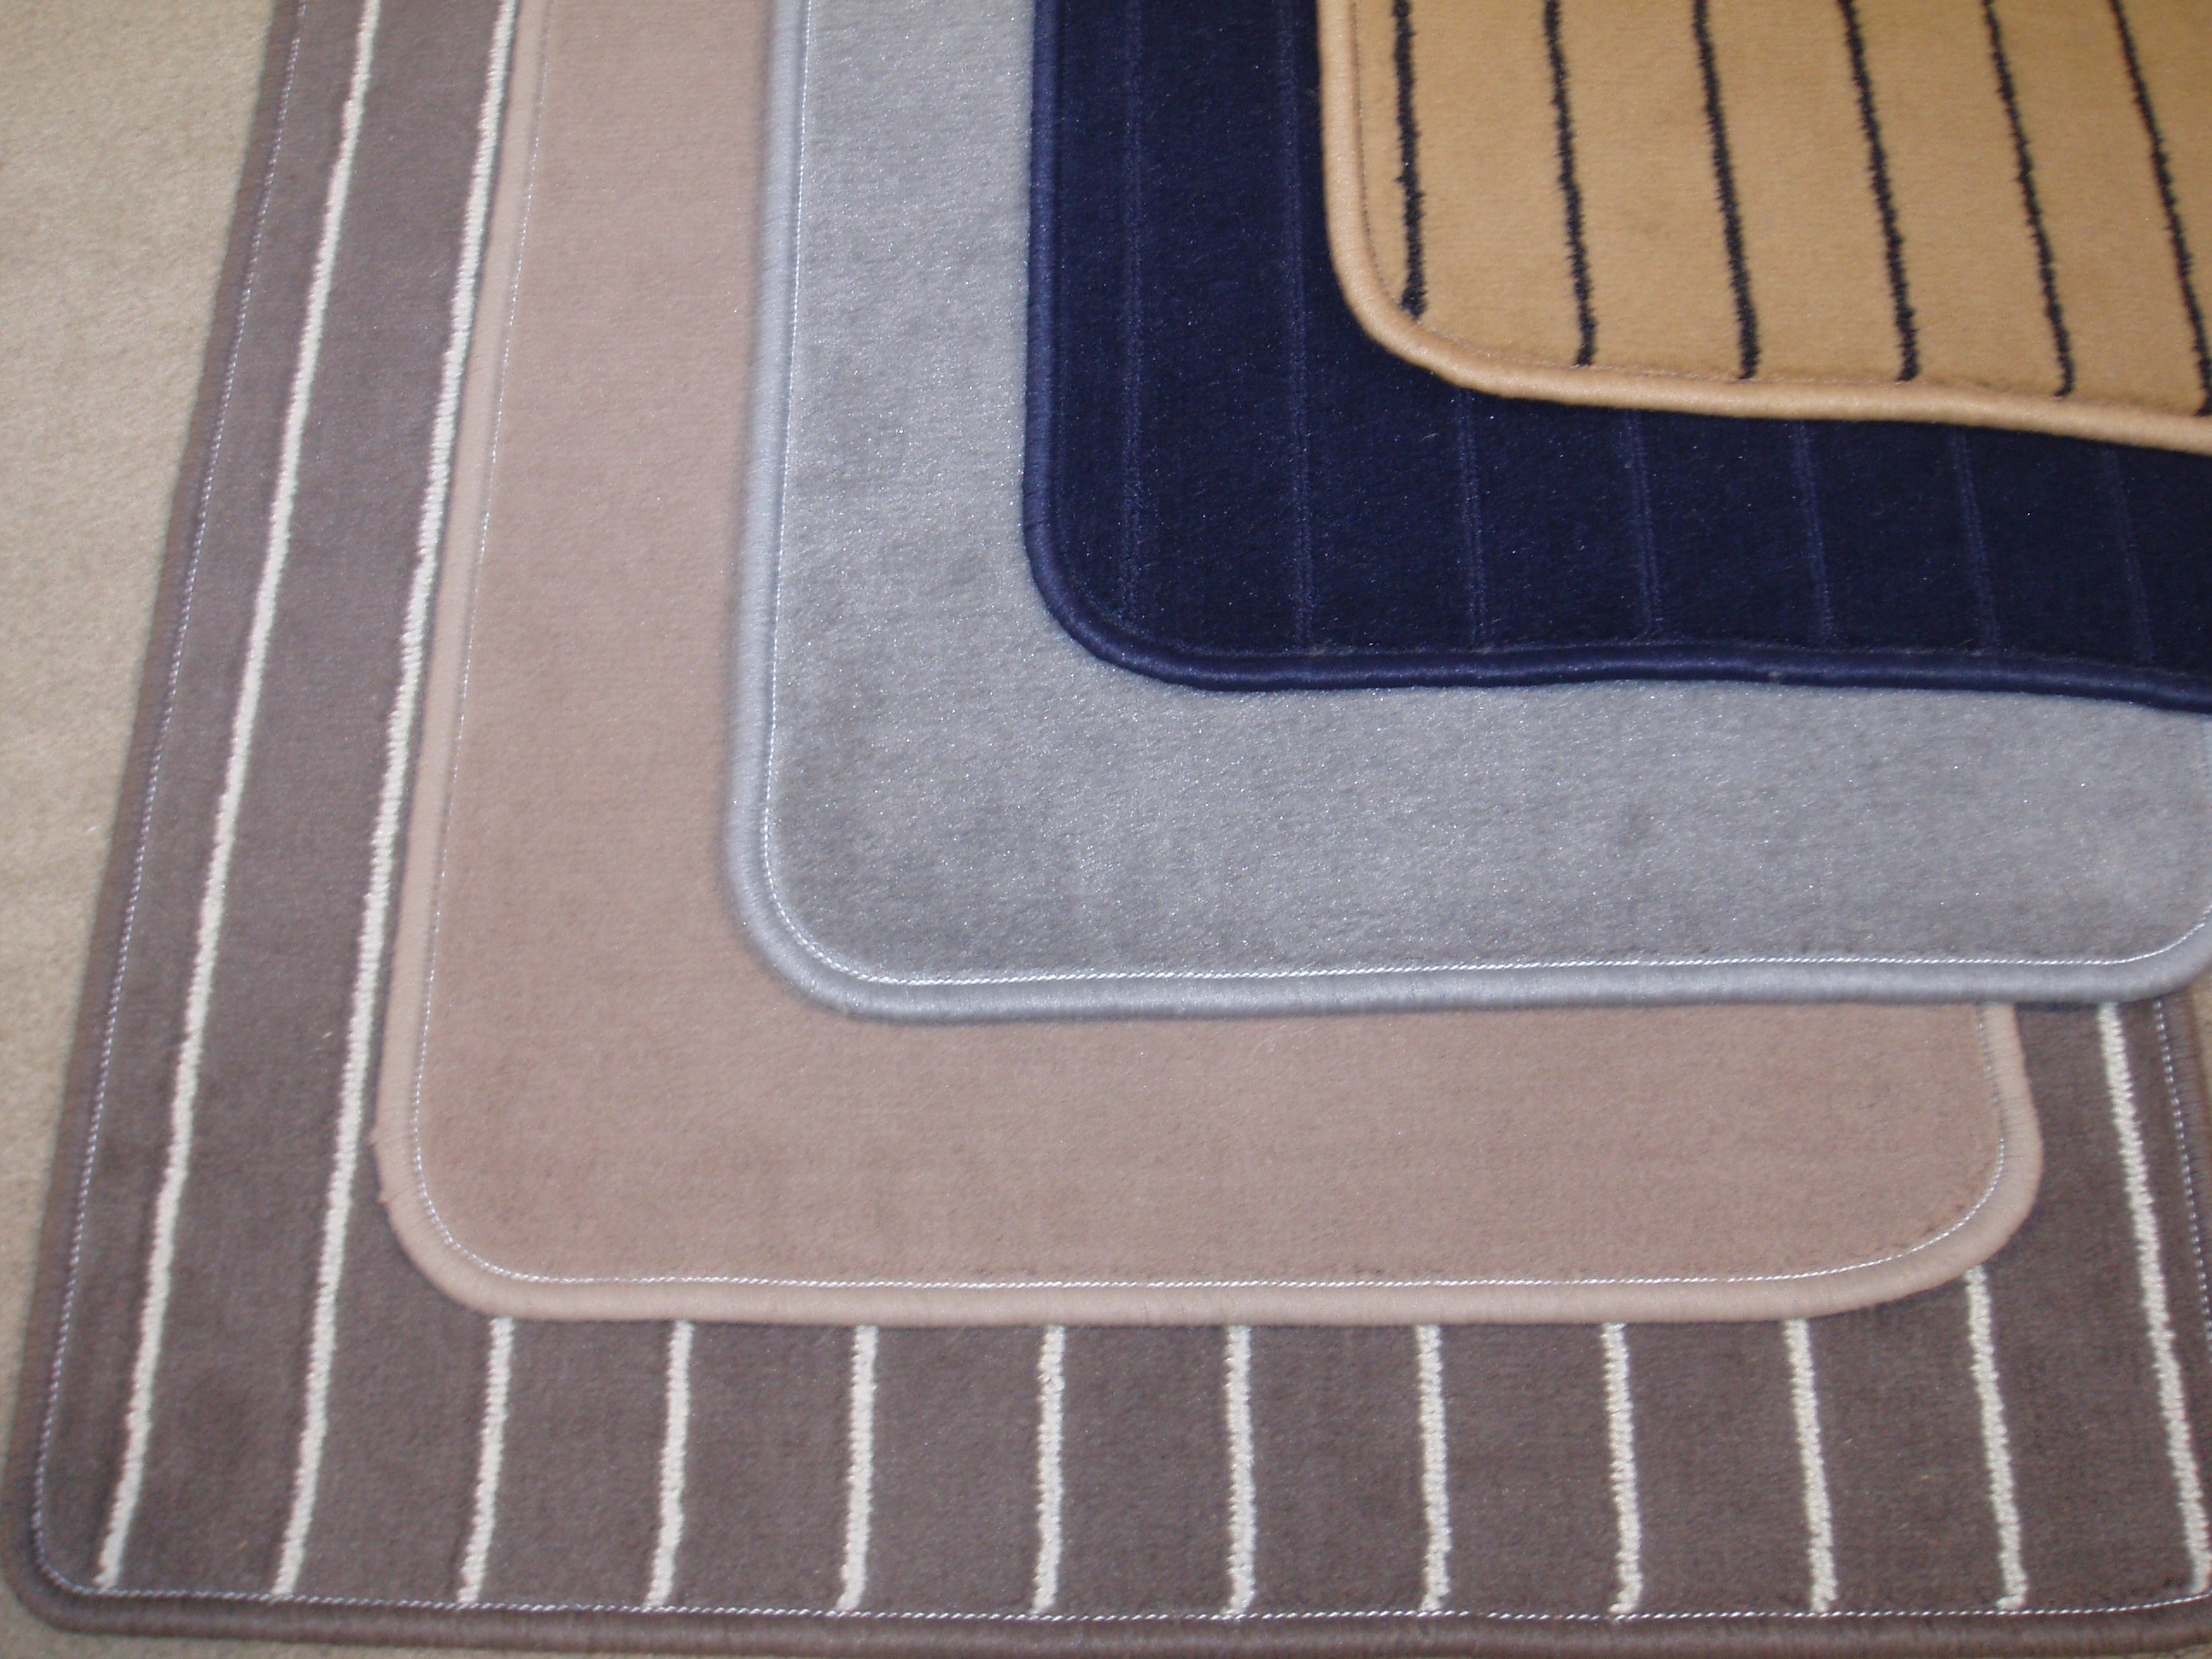 Marine Carpet Overlocking Prestige Trimmers Boat